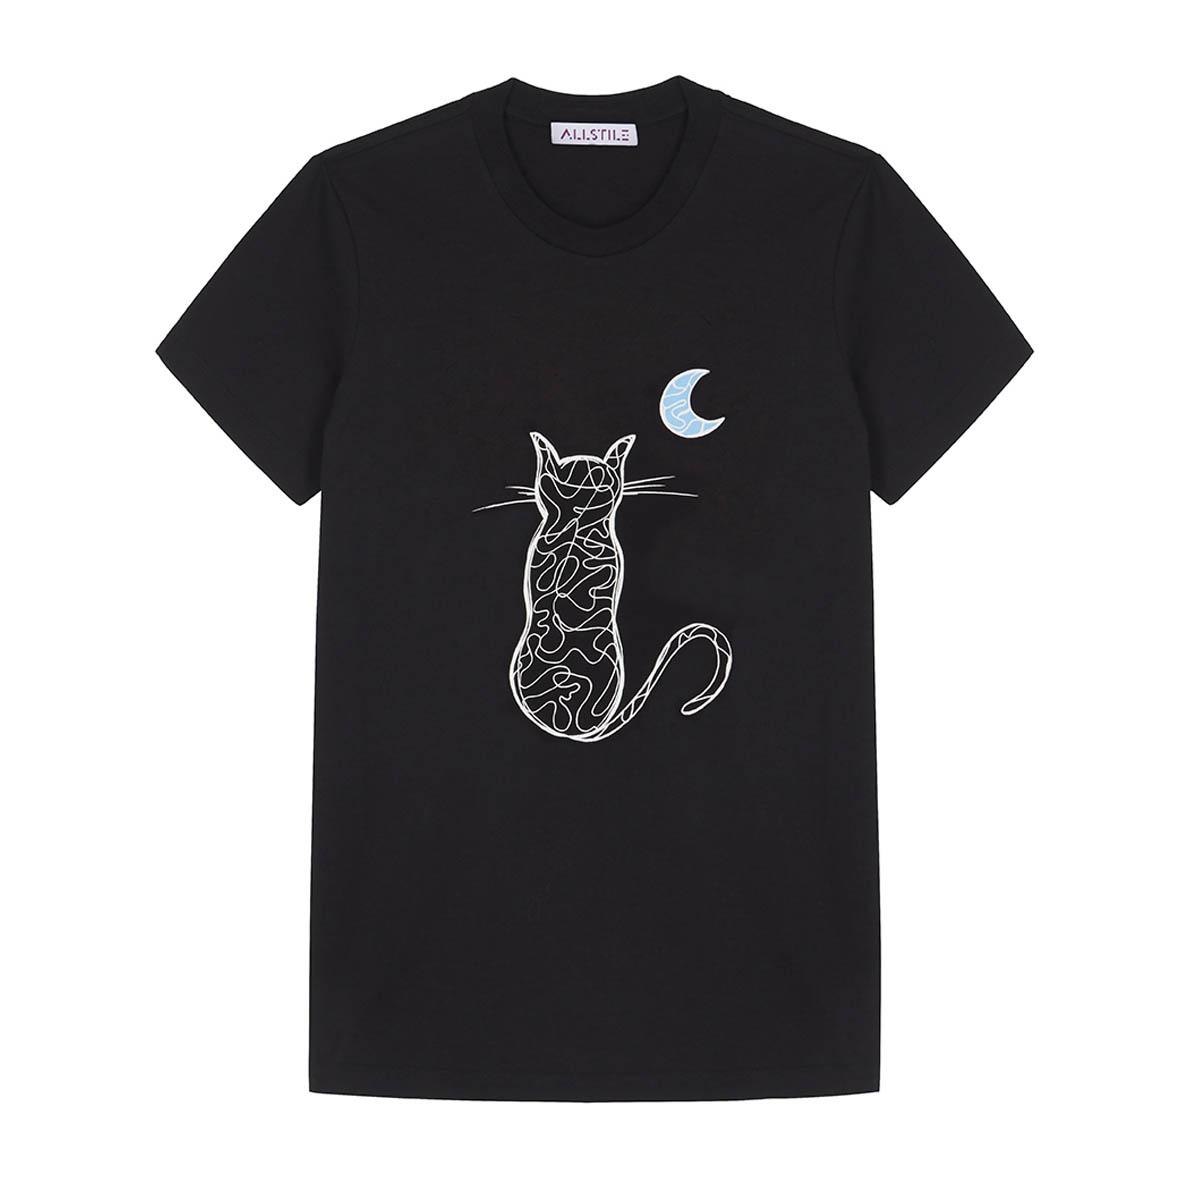 Clothing - Luna Catum T-Shirt - Black